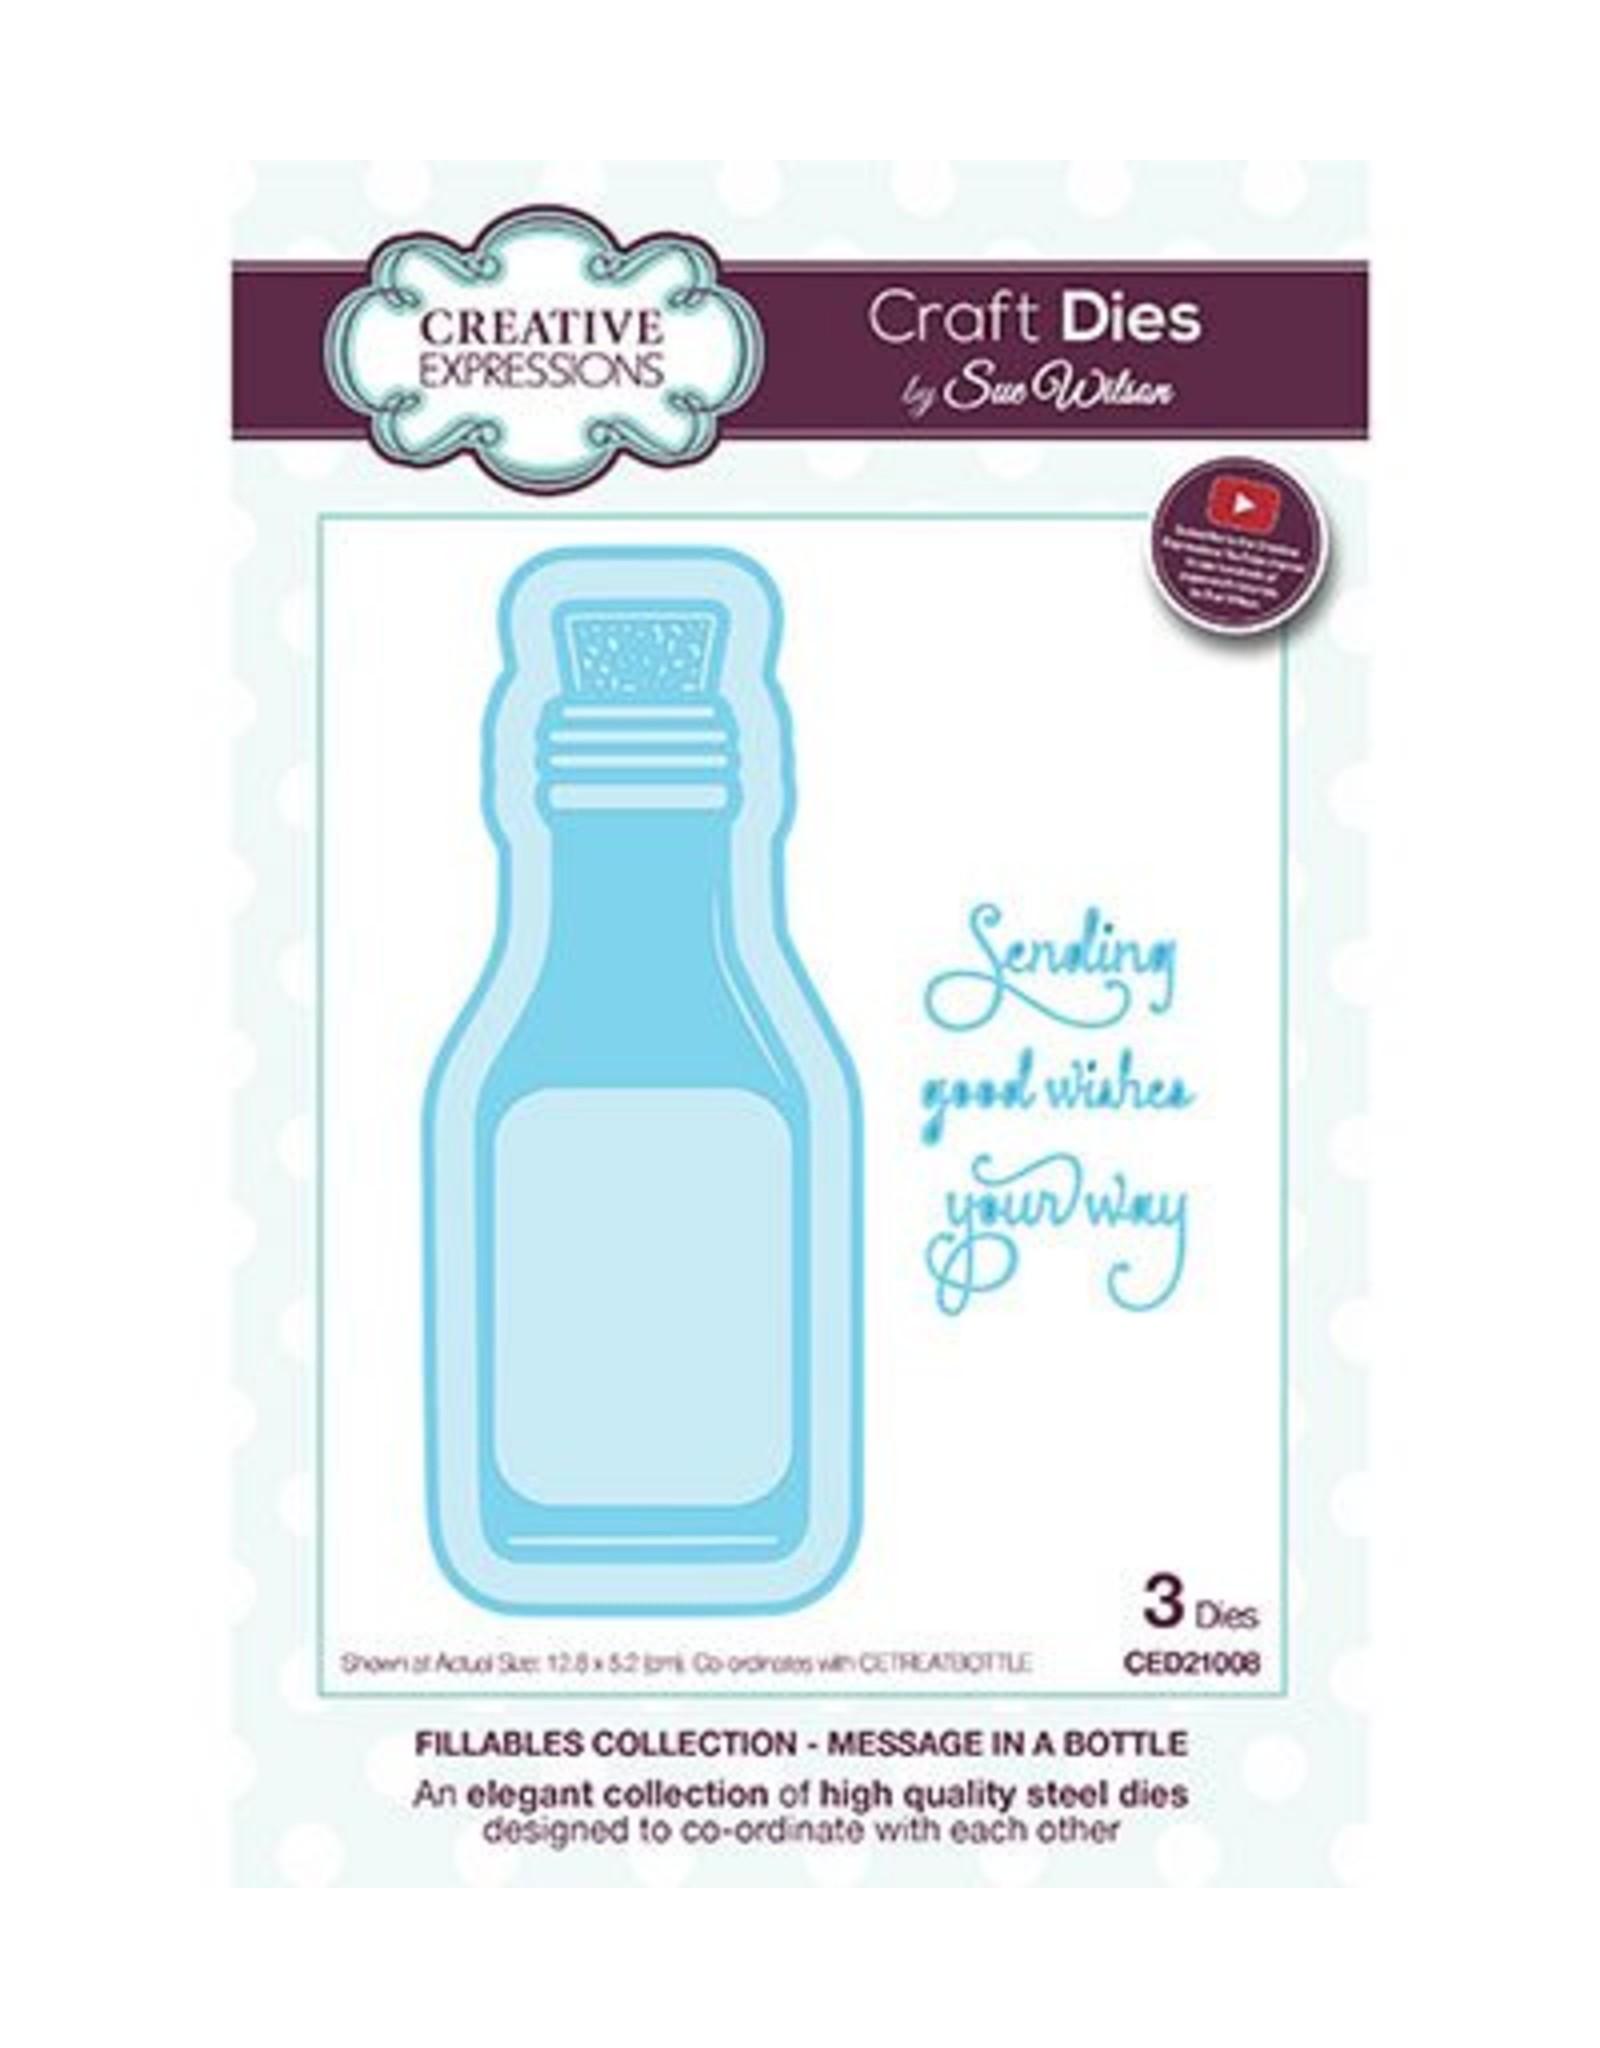 Creative Expressions Creative Expressions crafts dies Message in a Bottle CED21008